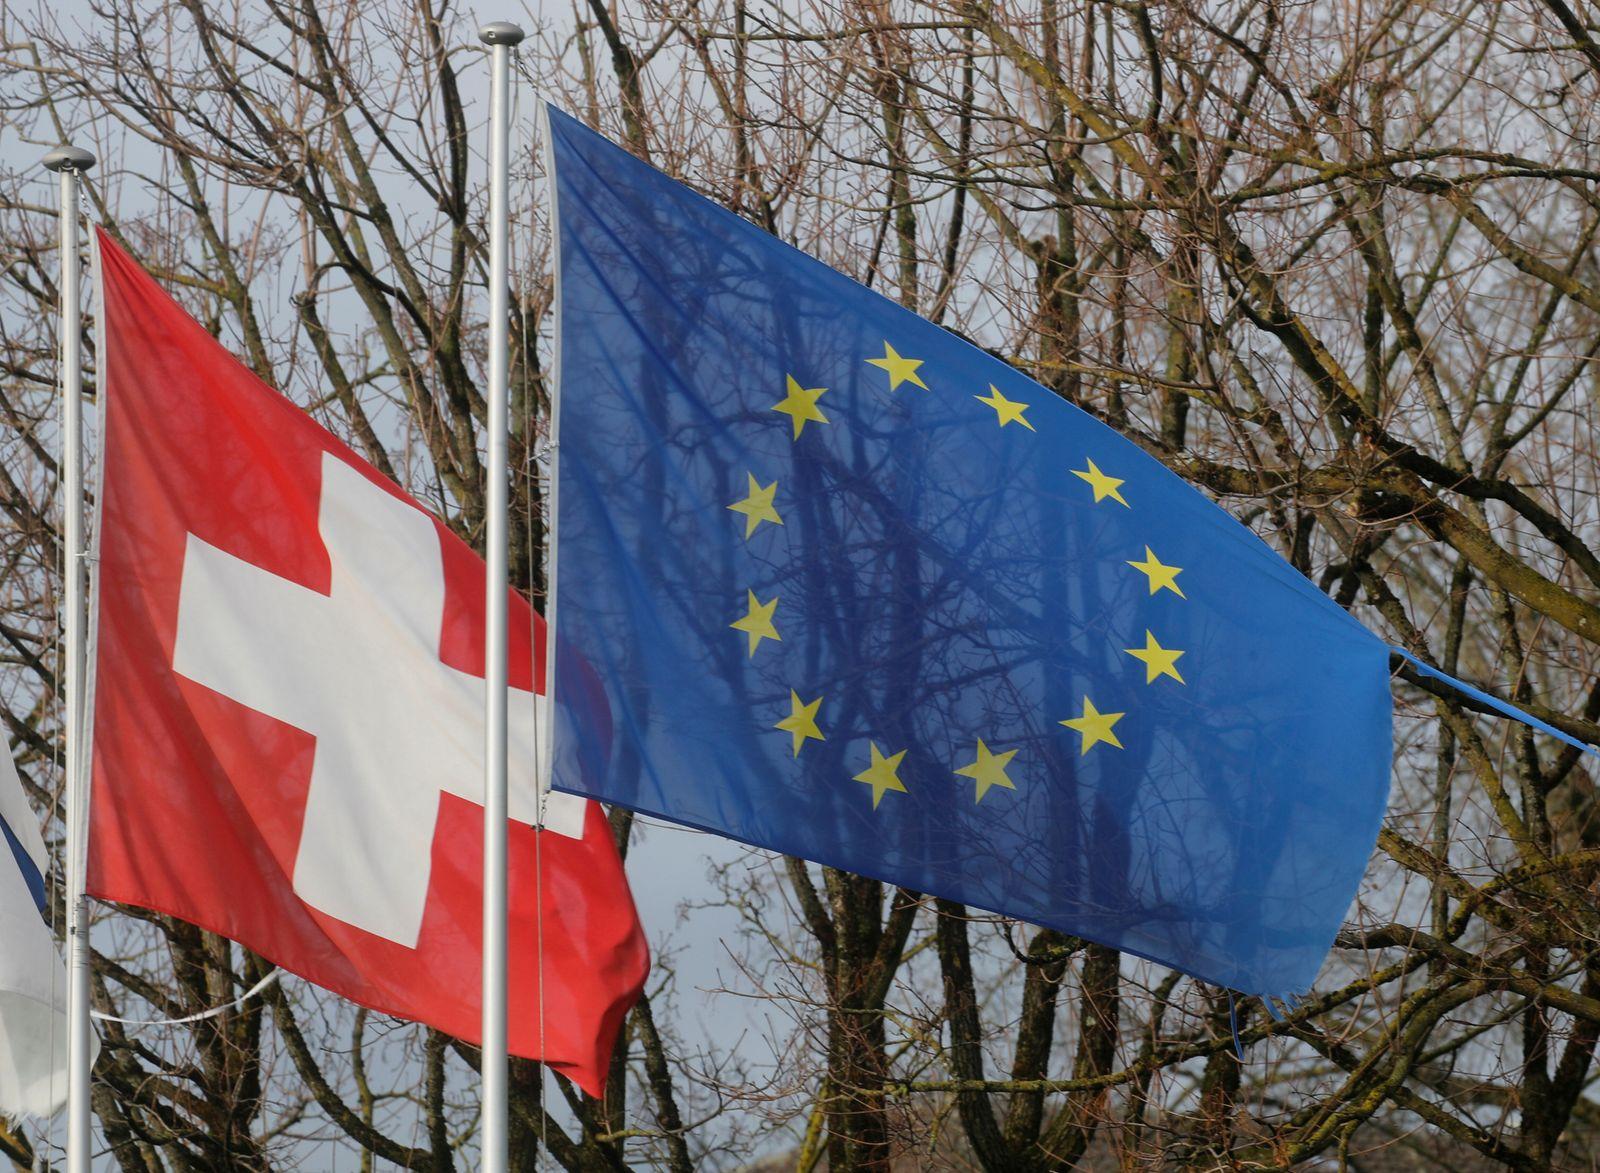 FILE PHOTO: Switzerland's national flag flies beside the one of the European Union in Steinhausen